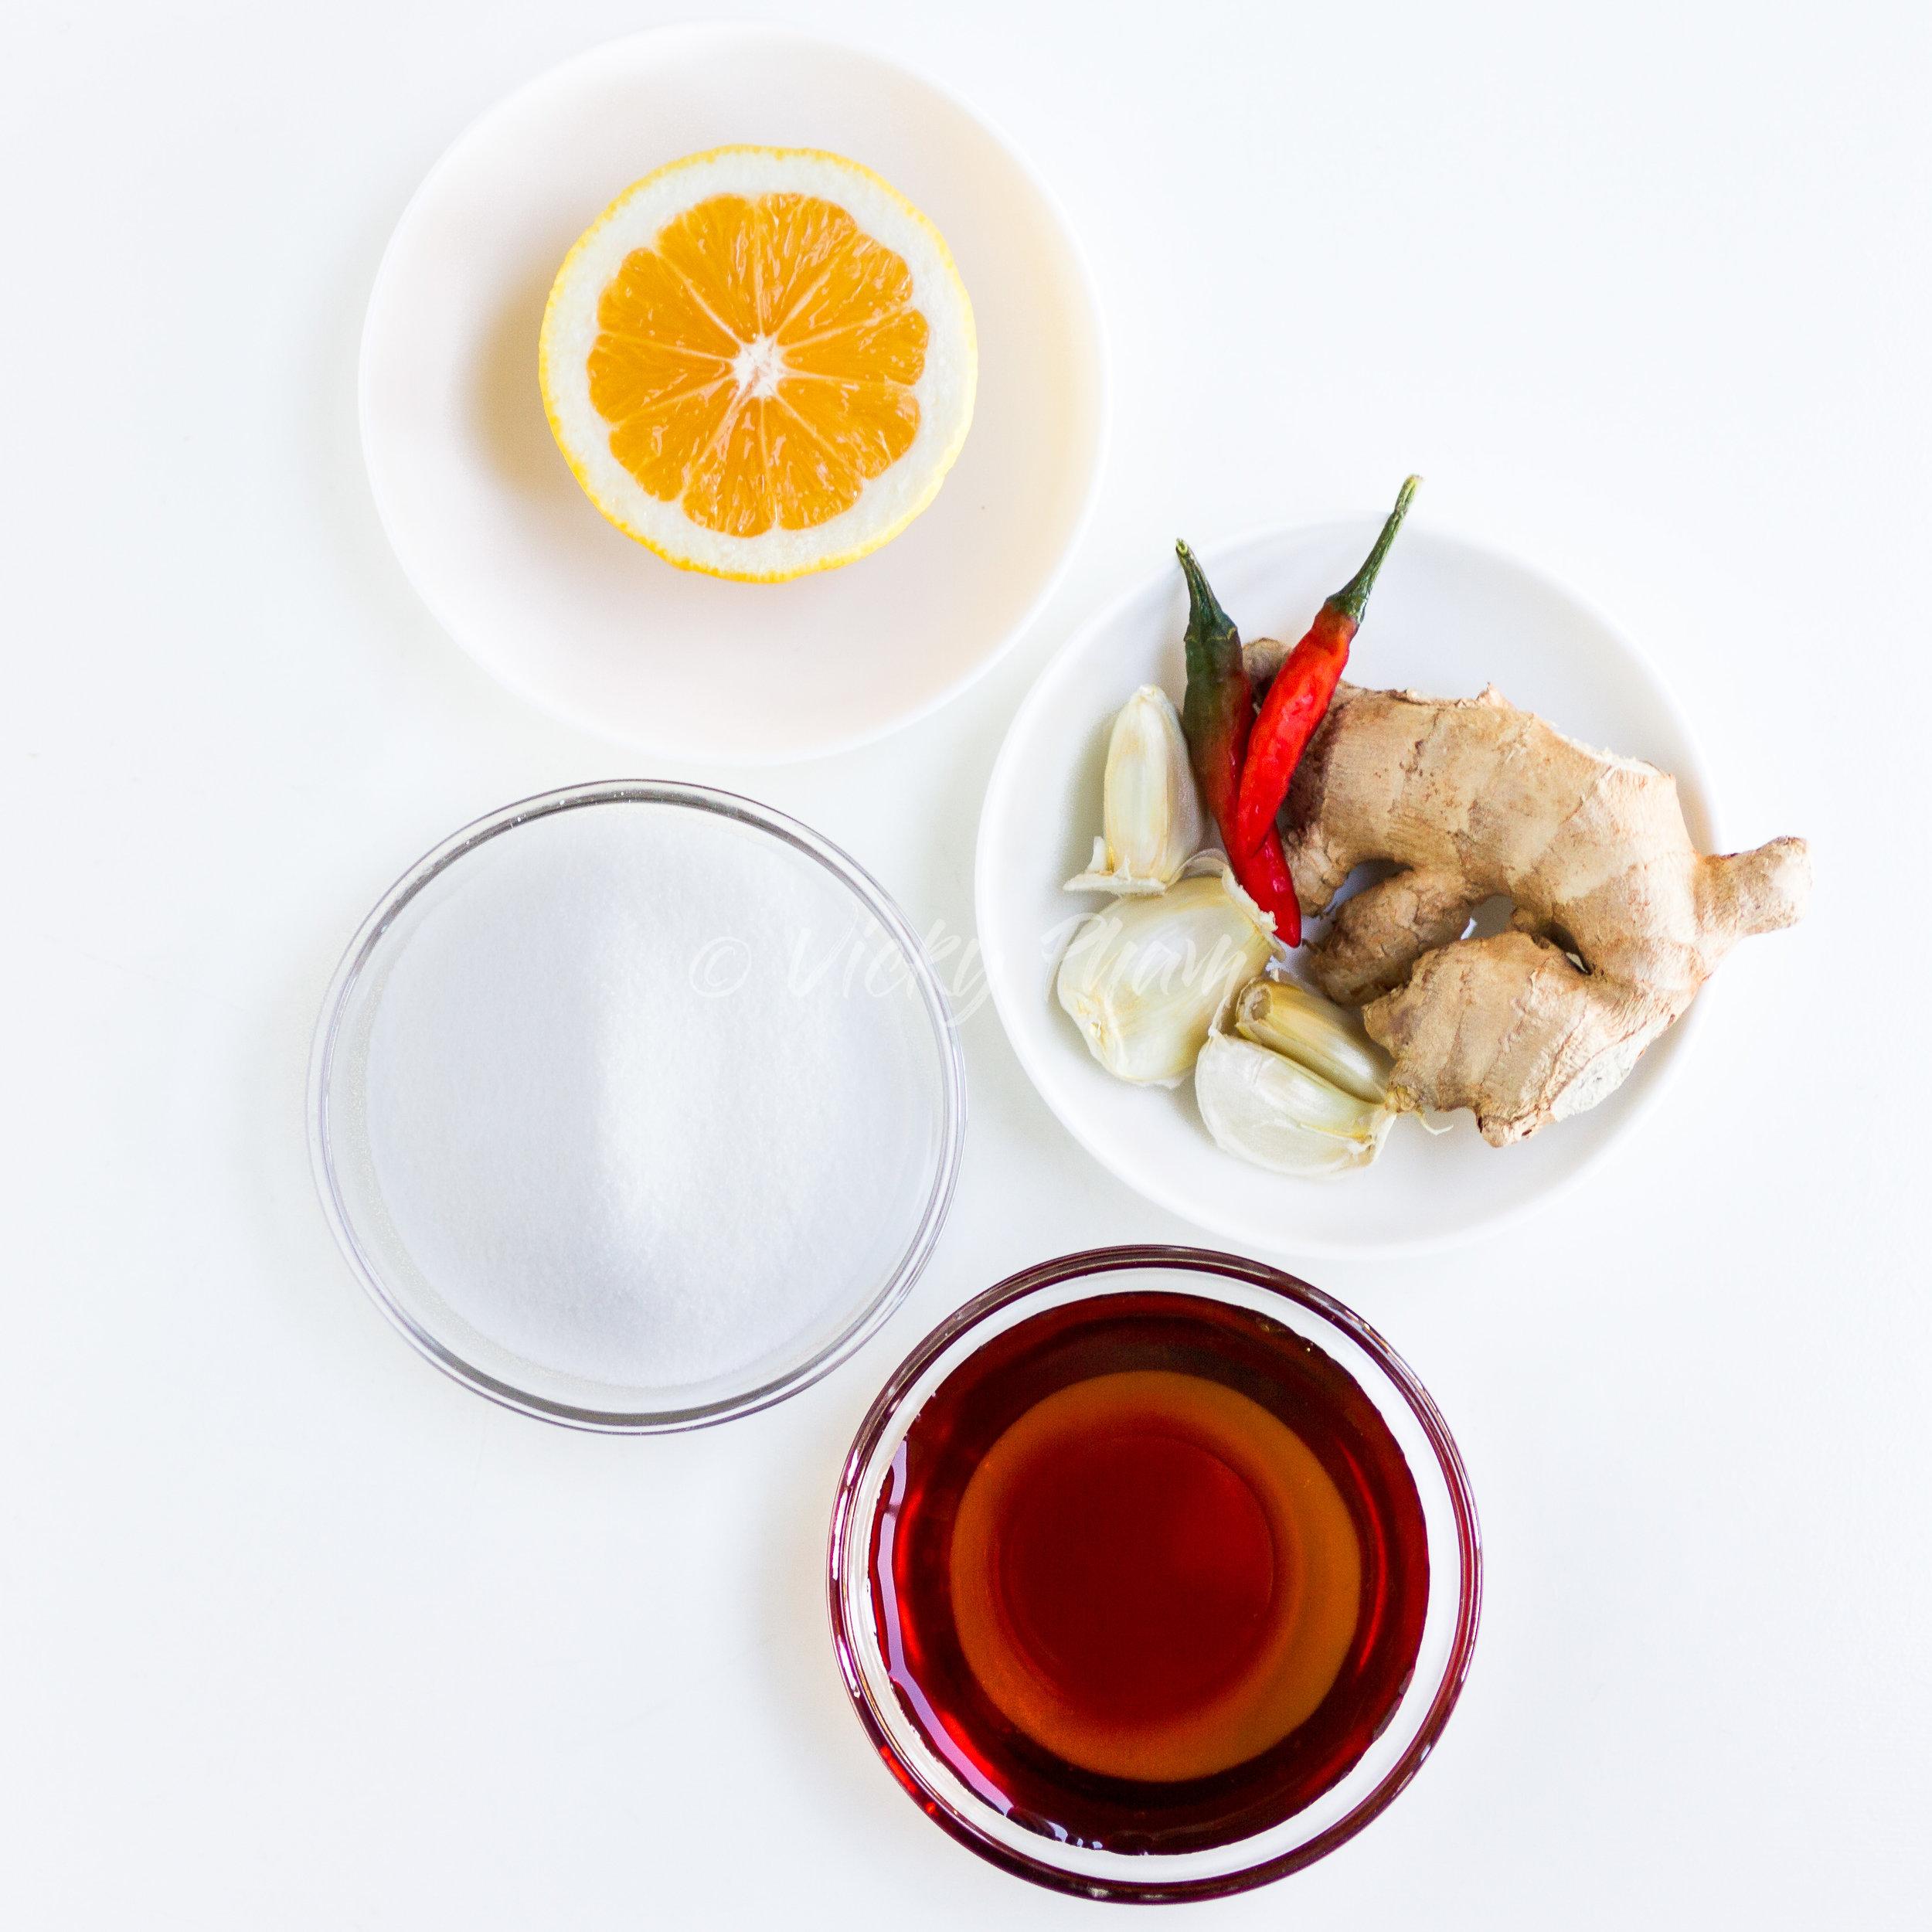 Ginger Fish Sauce Ingredients: Lemon, garlic, chili peppers, ginger, fish sauce and sugar